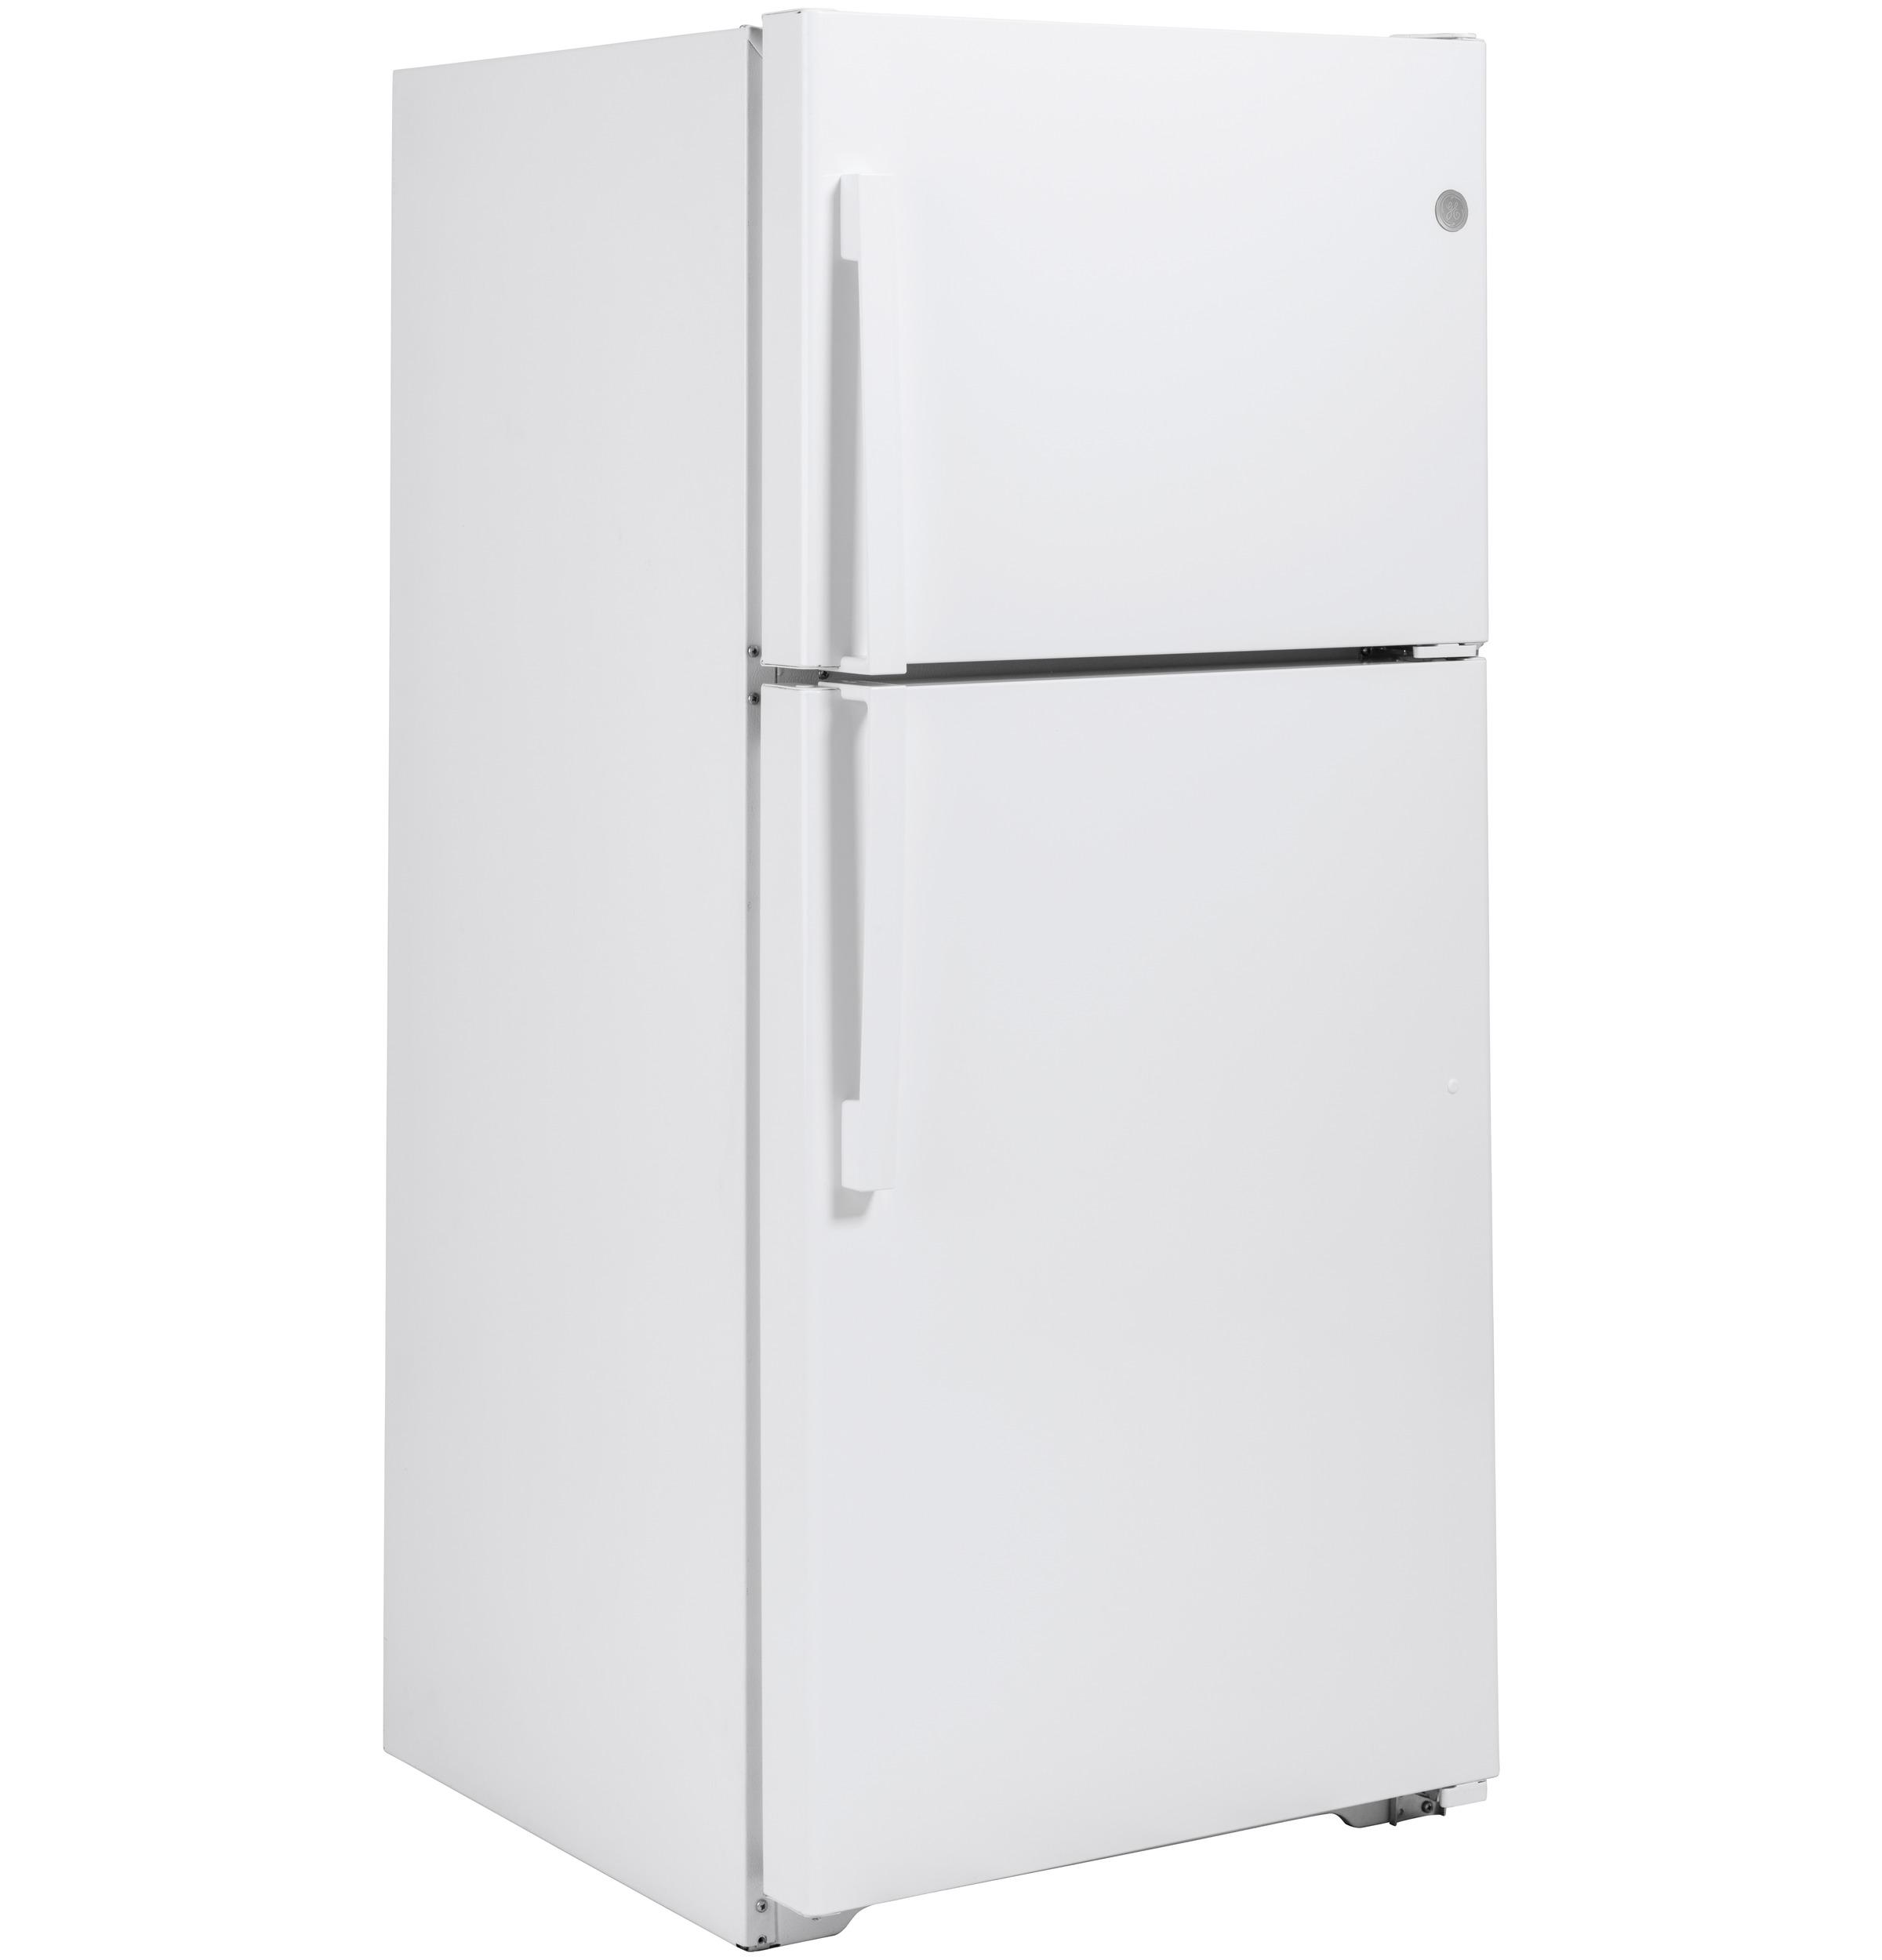 Model: GTS22KGNRWW | GE GE® 21.9 Cu. Ft. Top-Freezer Refrigerator